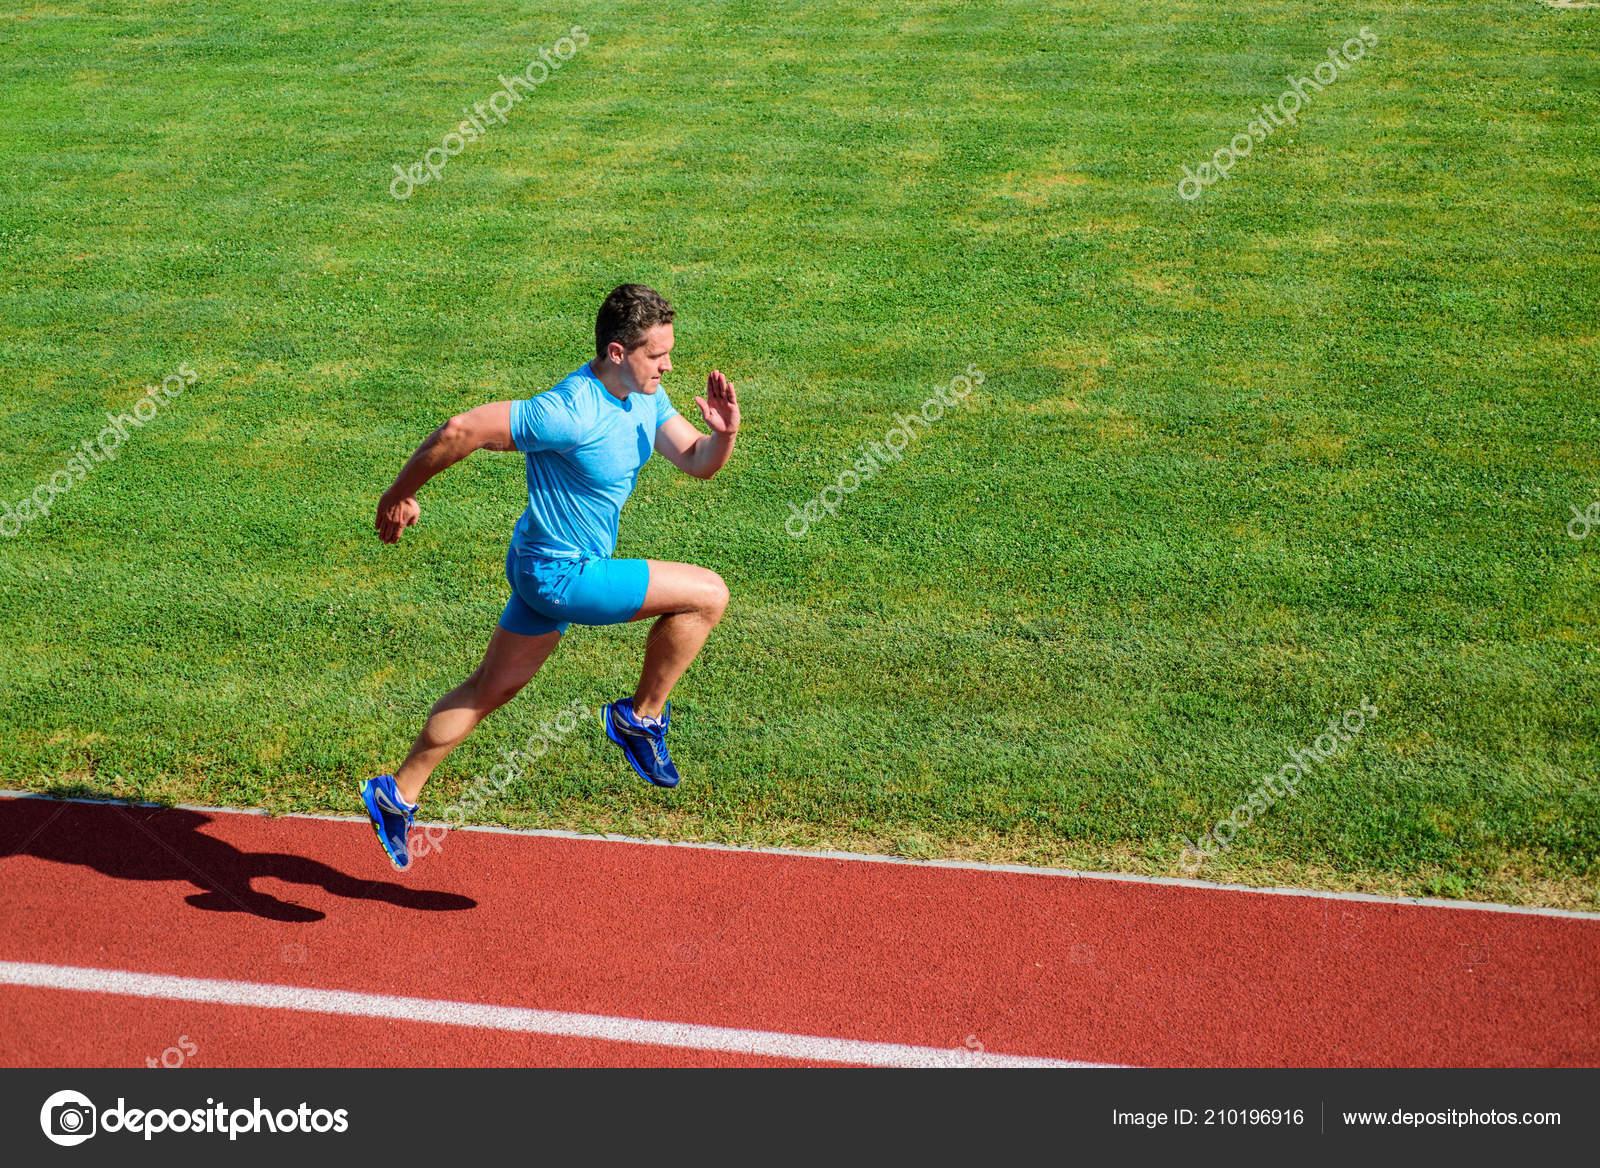 bdcada0eb3 Short distance running challenge. Boost speed. Athlete run track grass  background. Run into shape. Sprinter training at stadium track.